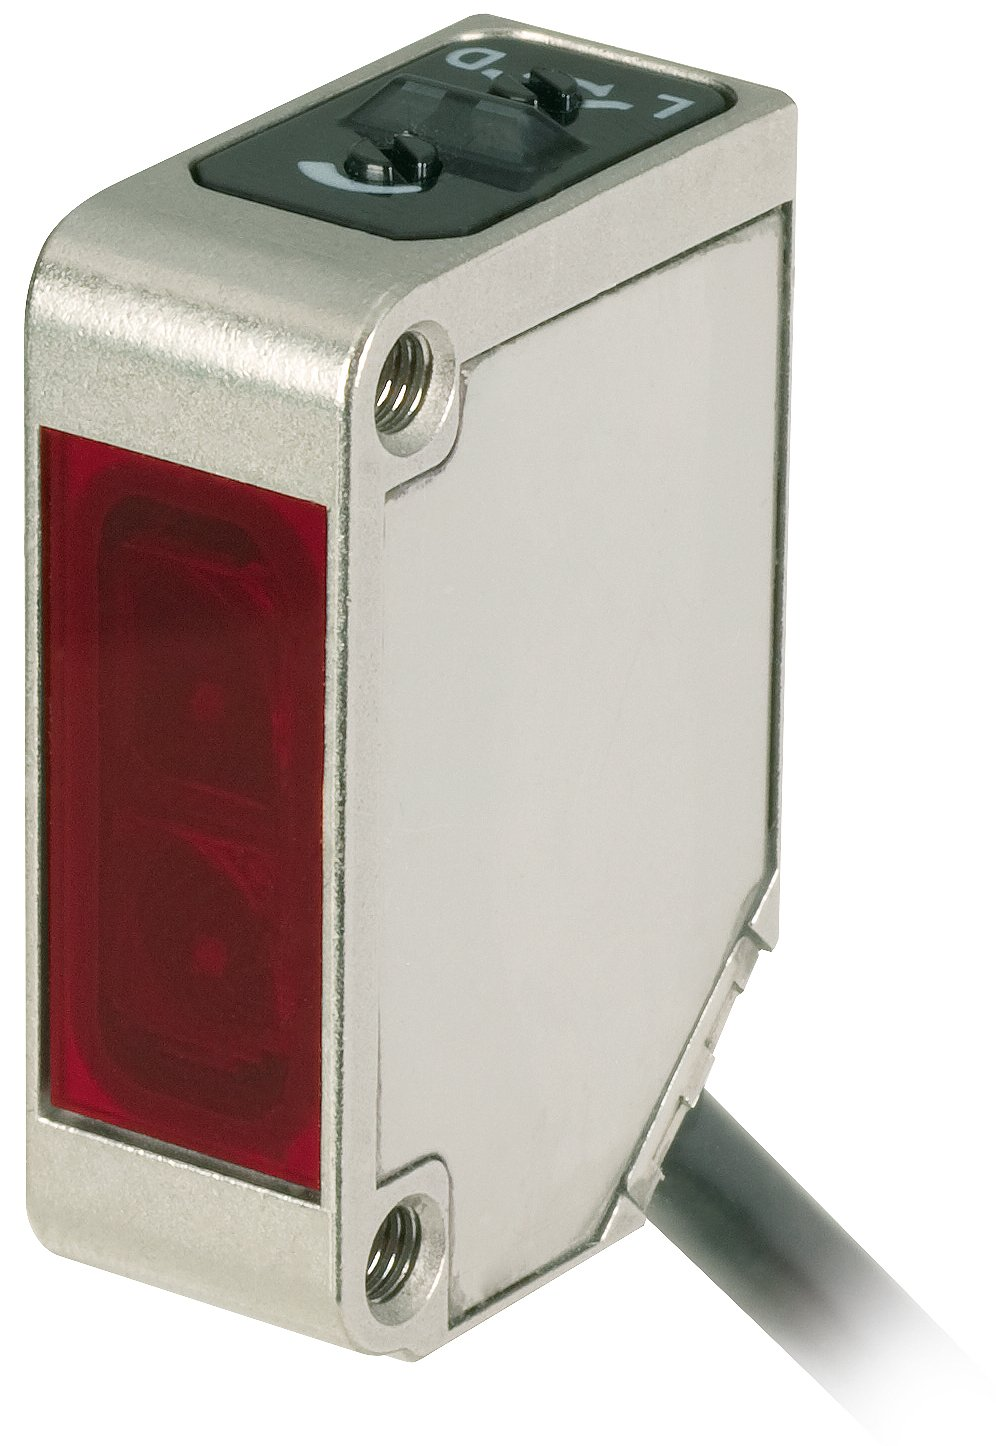 Optex FA 30 meter IP69K stainless steel thrubeam photoelectric beam sensor NPN output